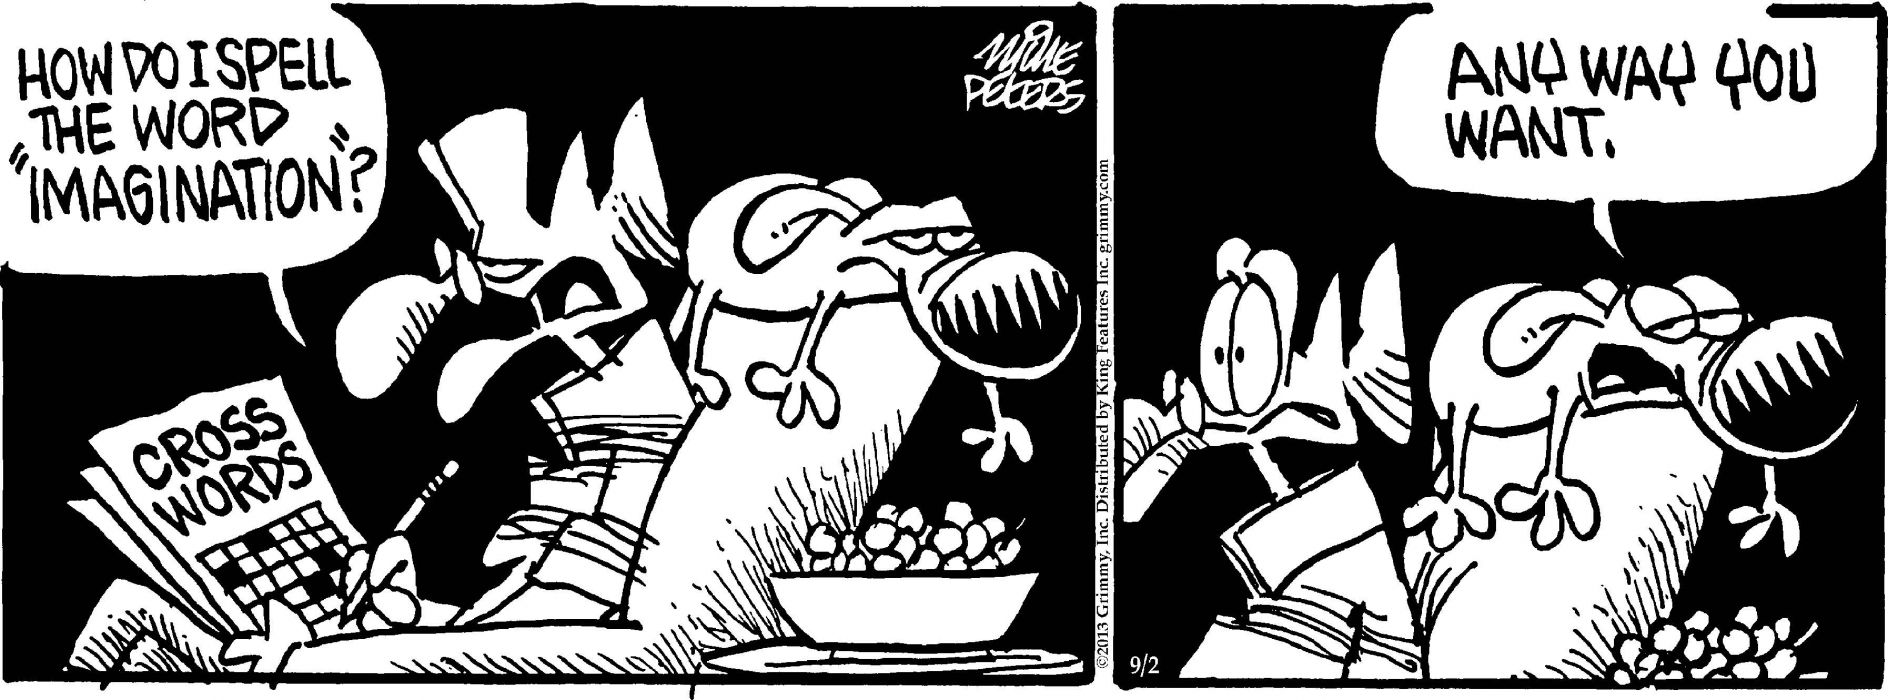 MOTHER-GOOSE-AND-GRIM mother goose grim funny humor comicstrip (18) wallpaper